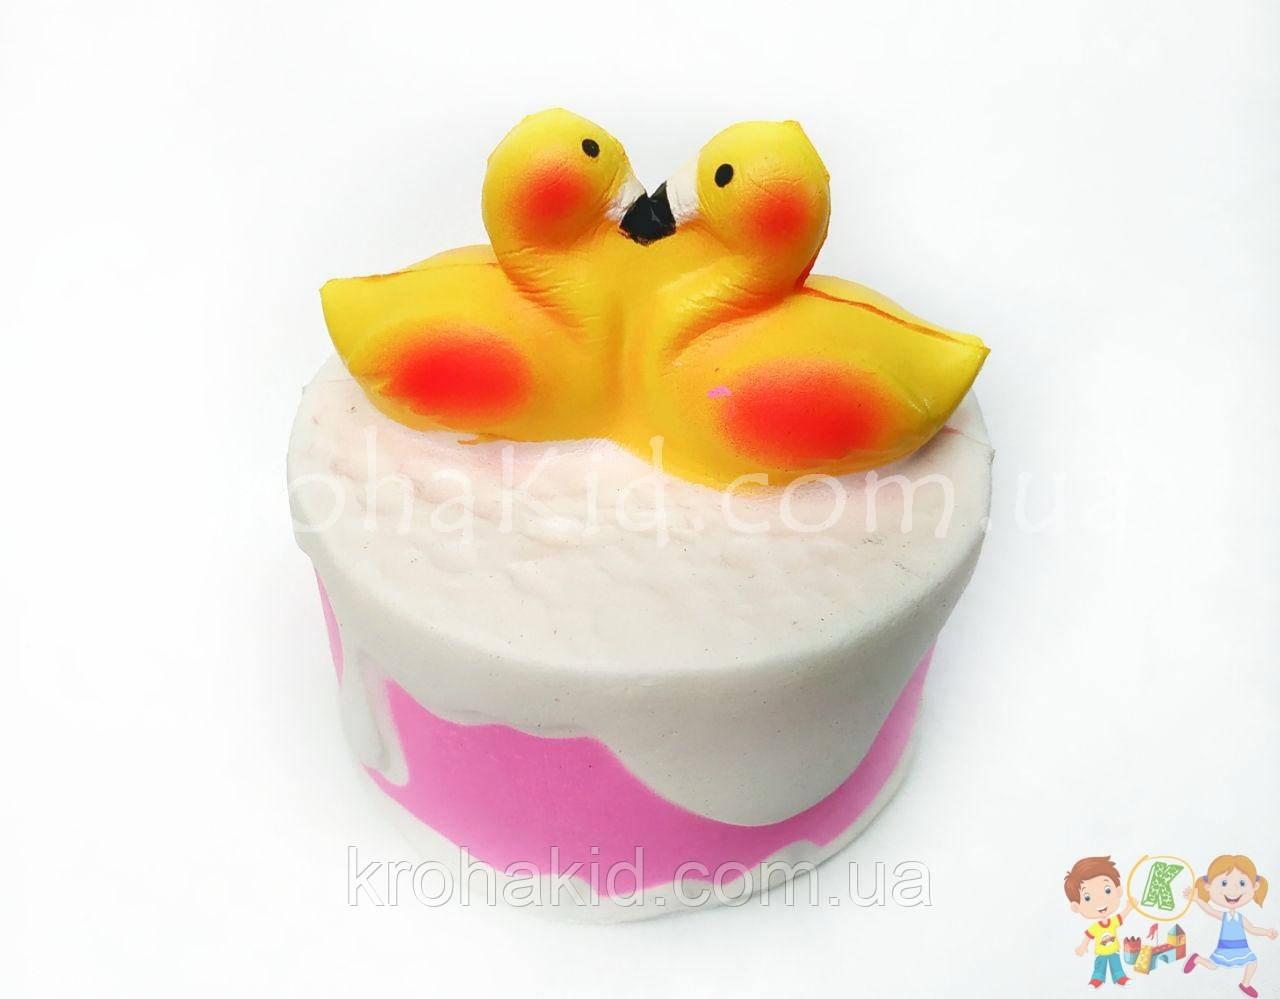 Сквиш тортик / торт с утками / Squishy / Сквуши / Игрушка-антистересс